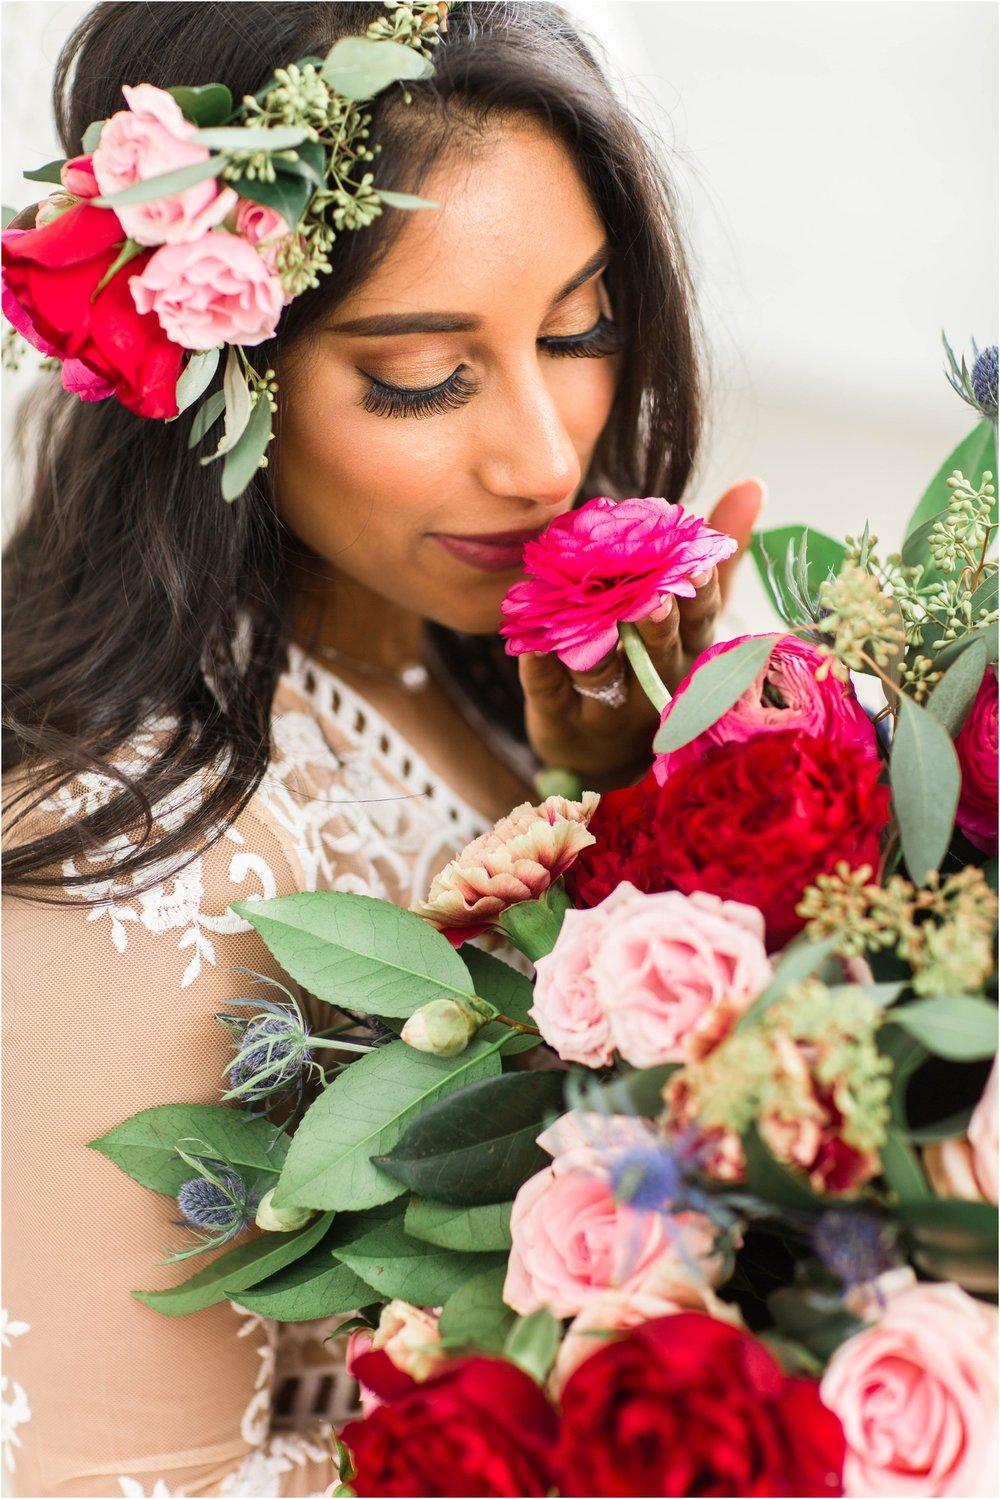 Mint-Room-Studios-Anniversary-Session-Toronto-Mississauga-Brampton-Scarborough-GTA-Pakistani-Indian-Wedding-Engagement-Photographer-Photography_0008.jpg